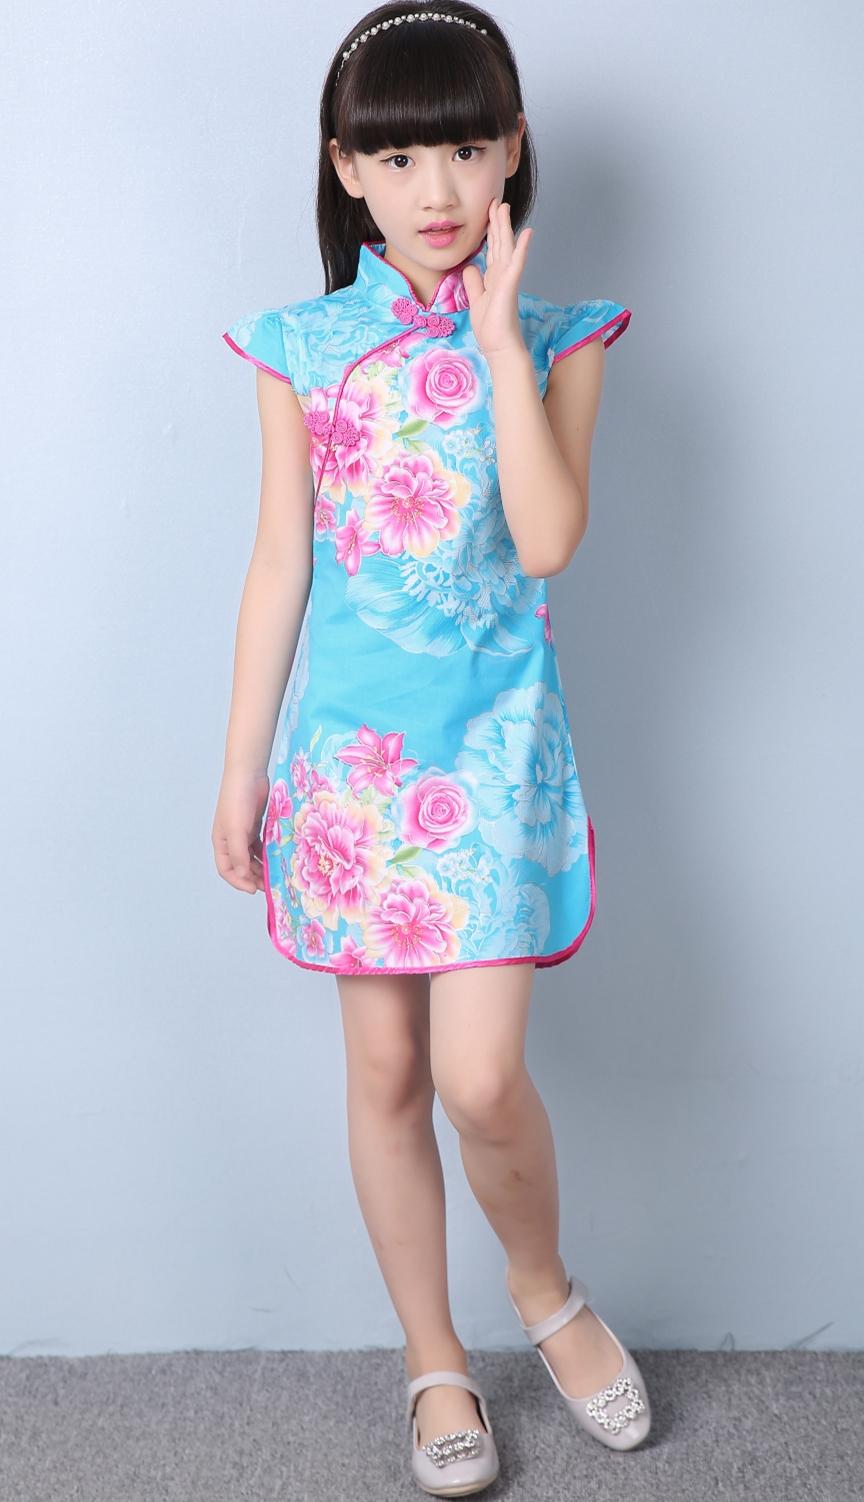 Linda new produts GGUUCCII Black White Navy Blue Bee Ace perfect veison Baby & Kids Clothing